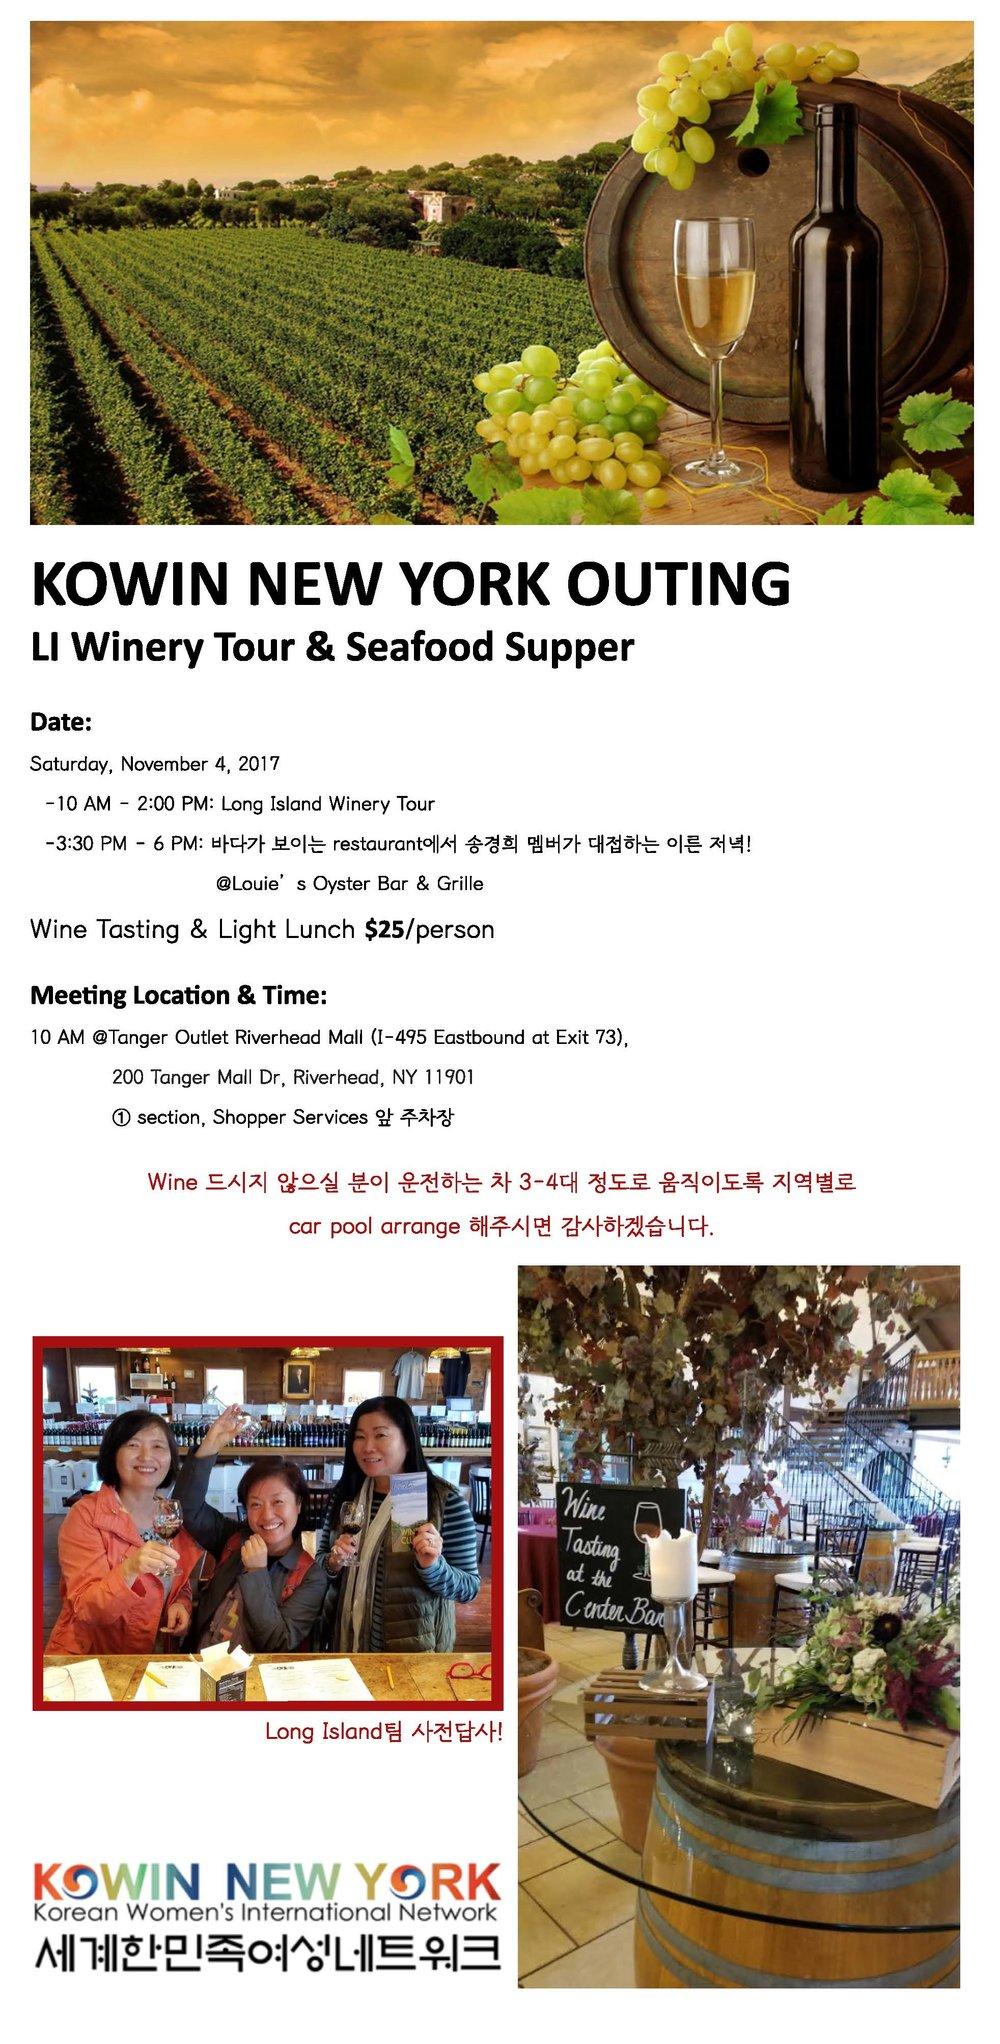 Flyer_KOWIN_QLI Winery event 11042017.jpg